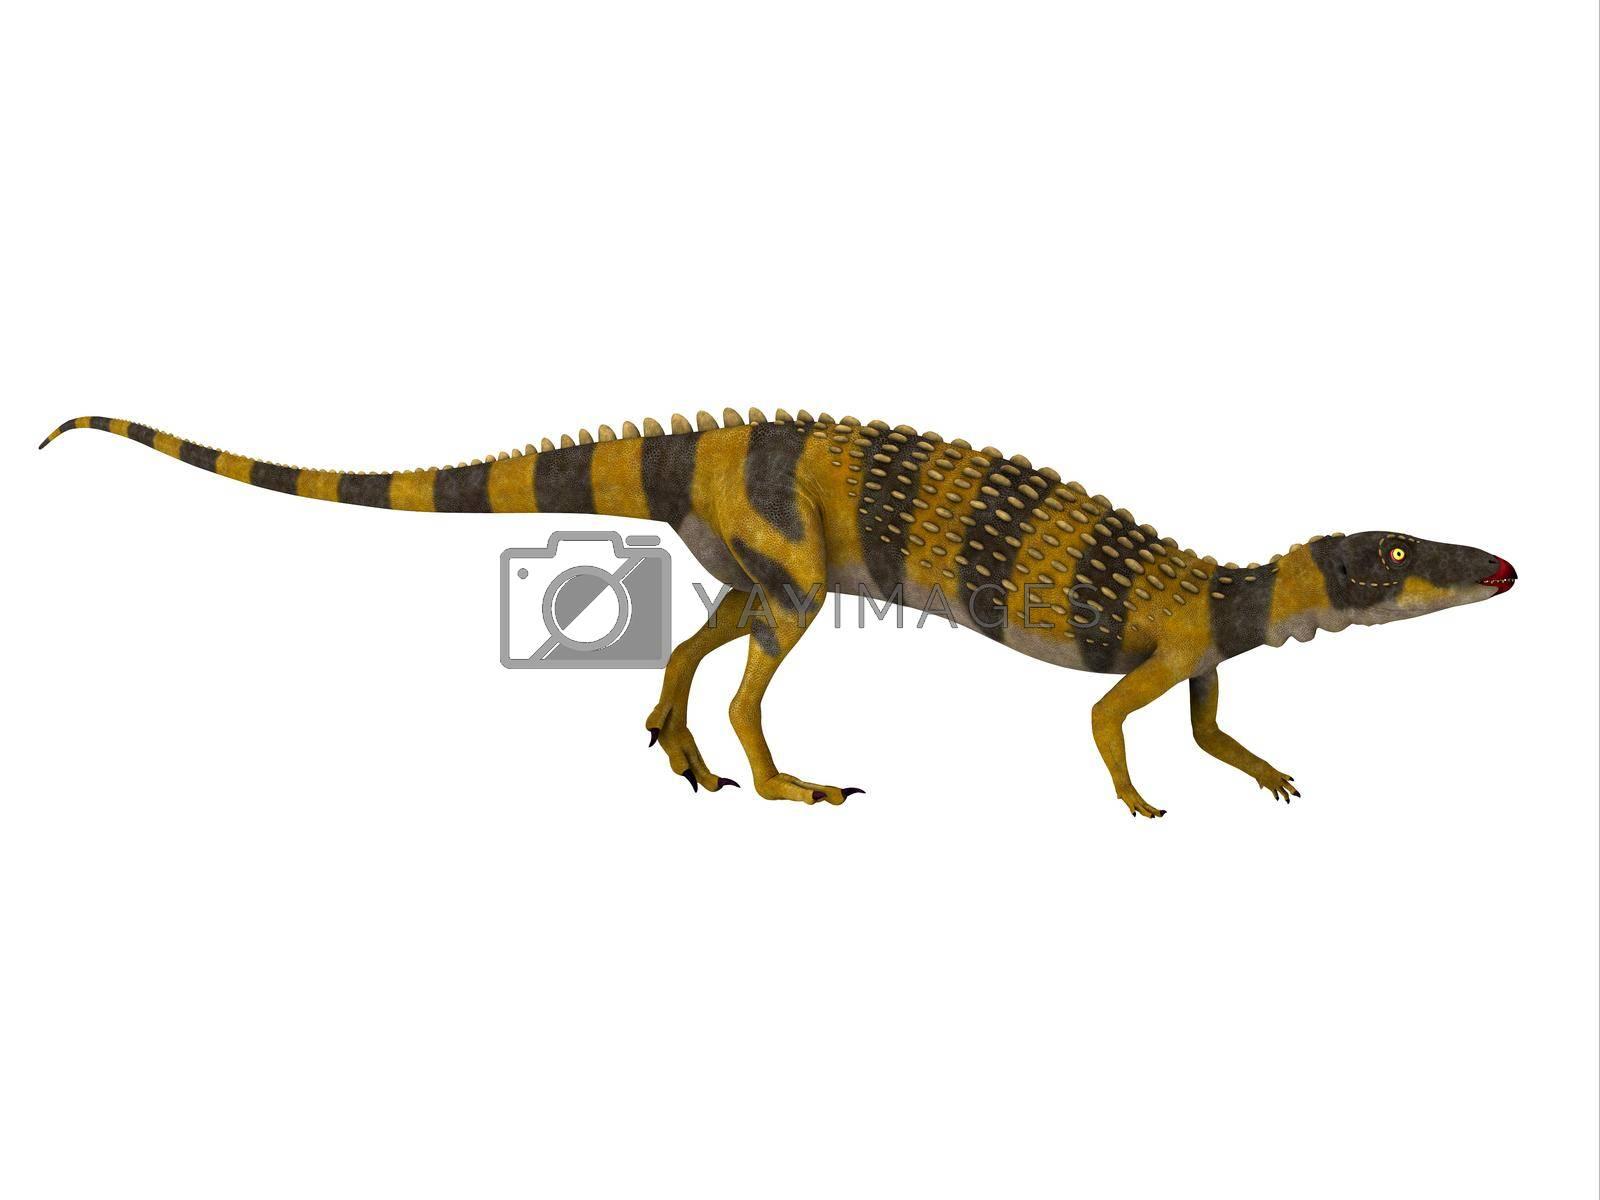 Royalty free image of Scutellosaurus Dinosaur Walking by Catmando